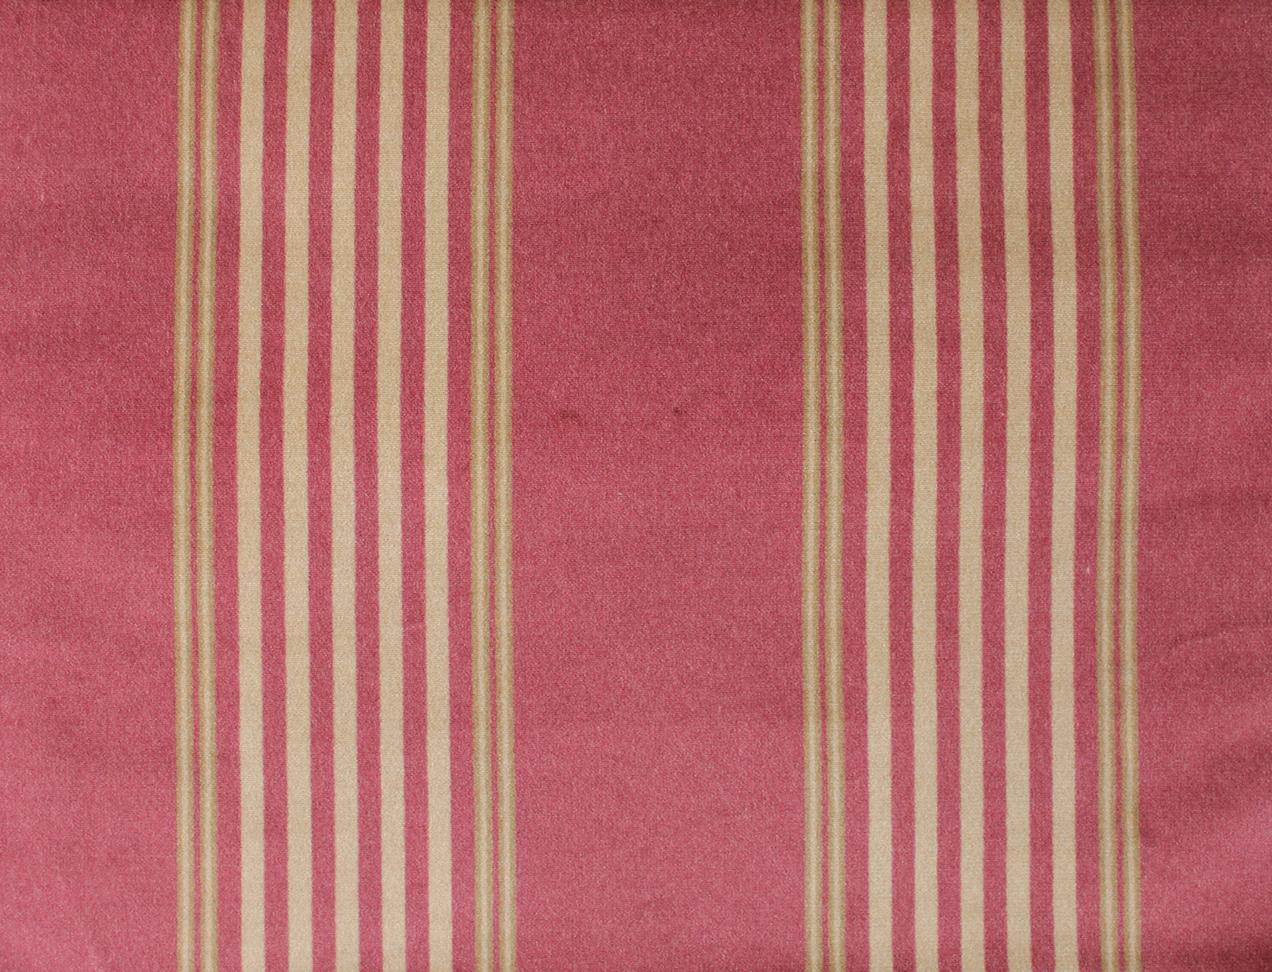 VENICE STRIPE Pink/Sand